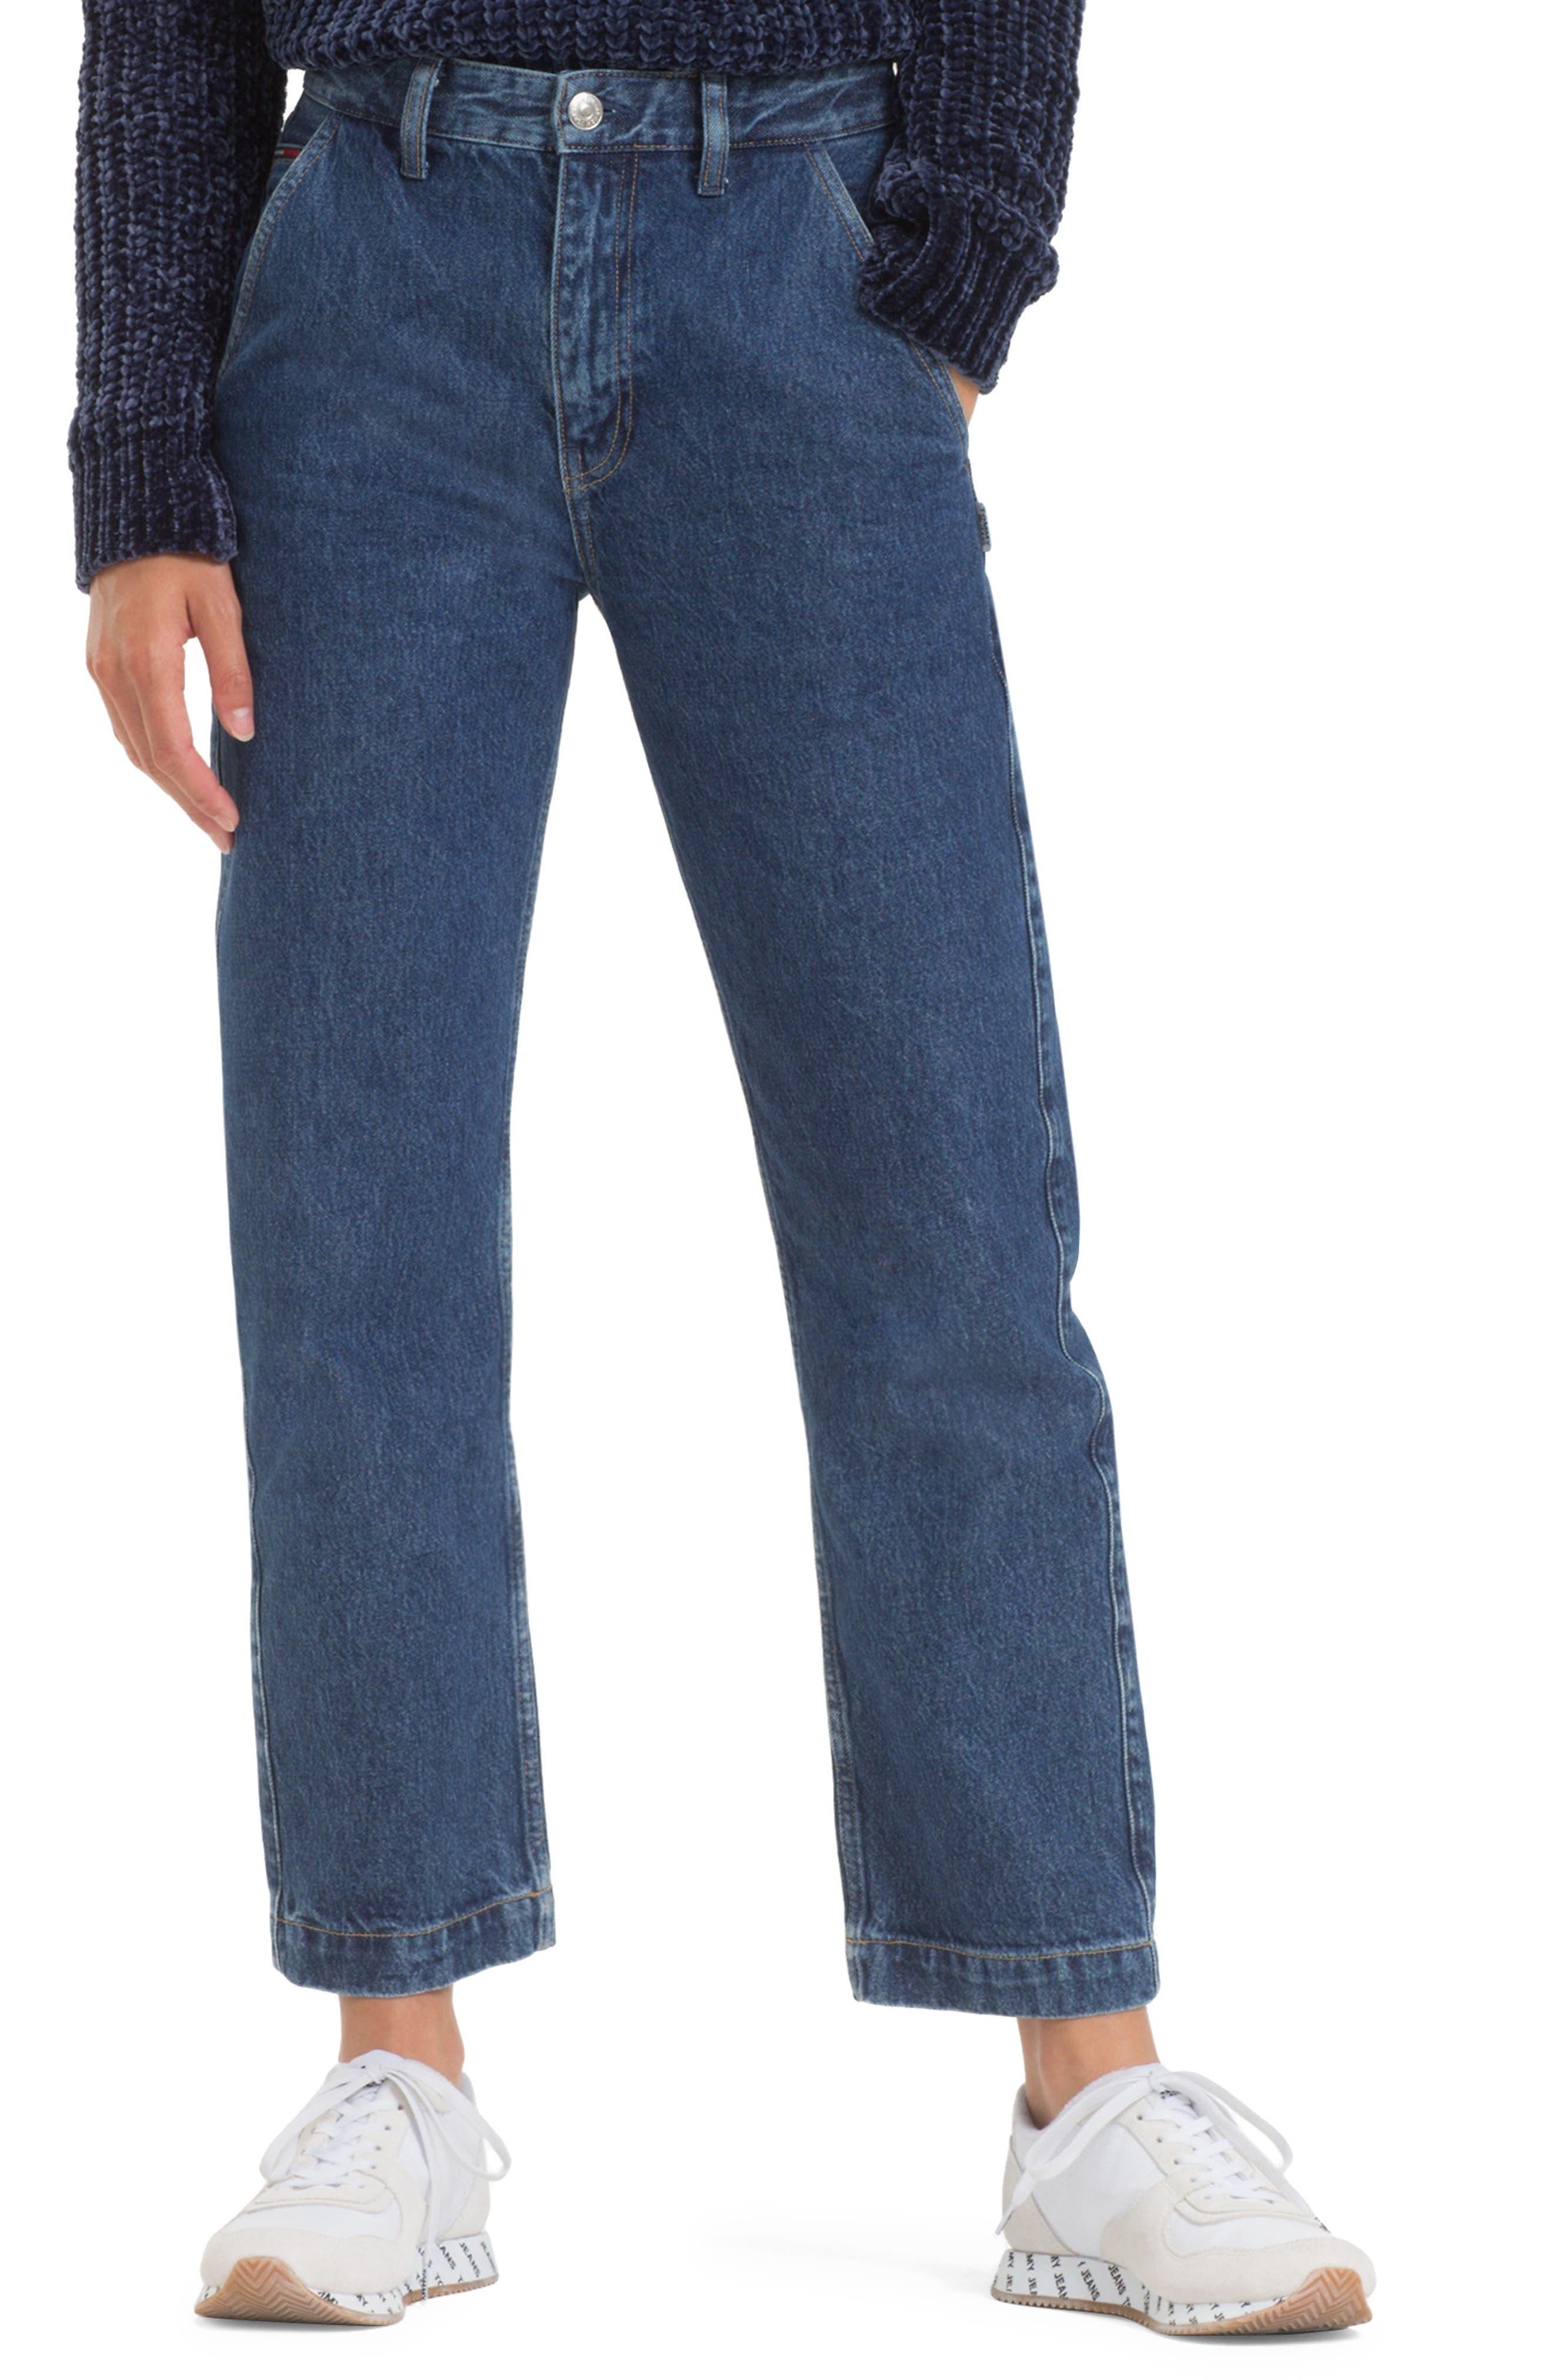 TJW Straight Leg Jeans,                         Main,                         color, GOUGH MID BLUE RIGID